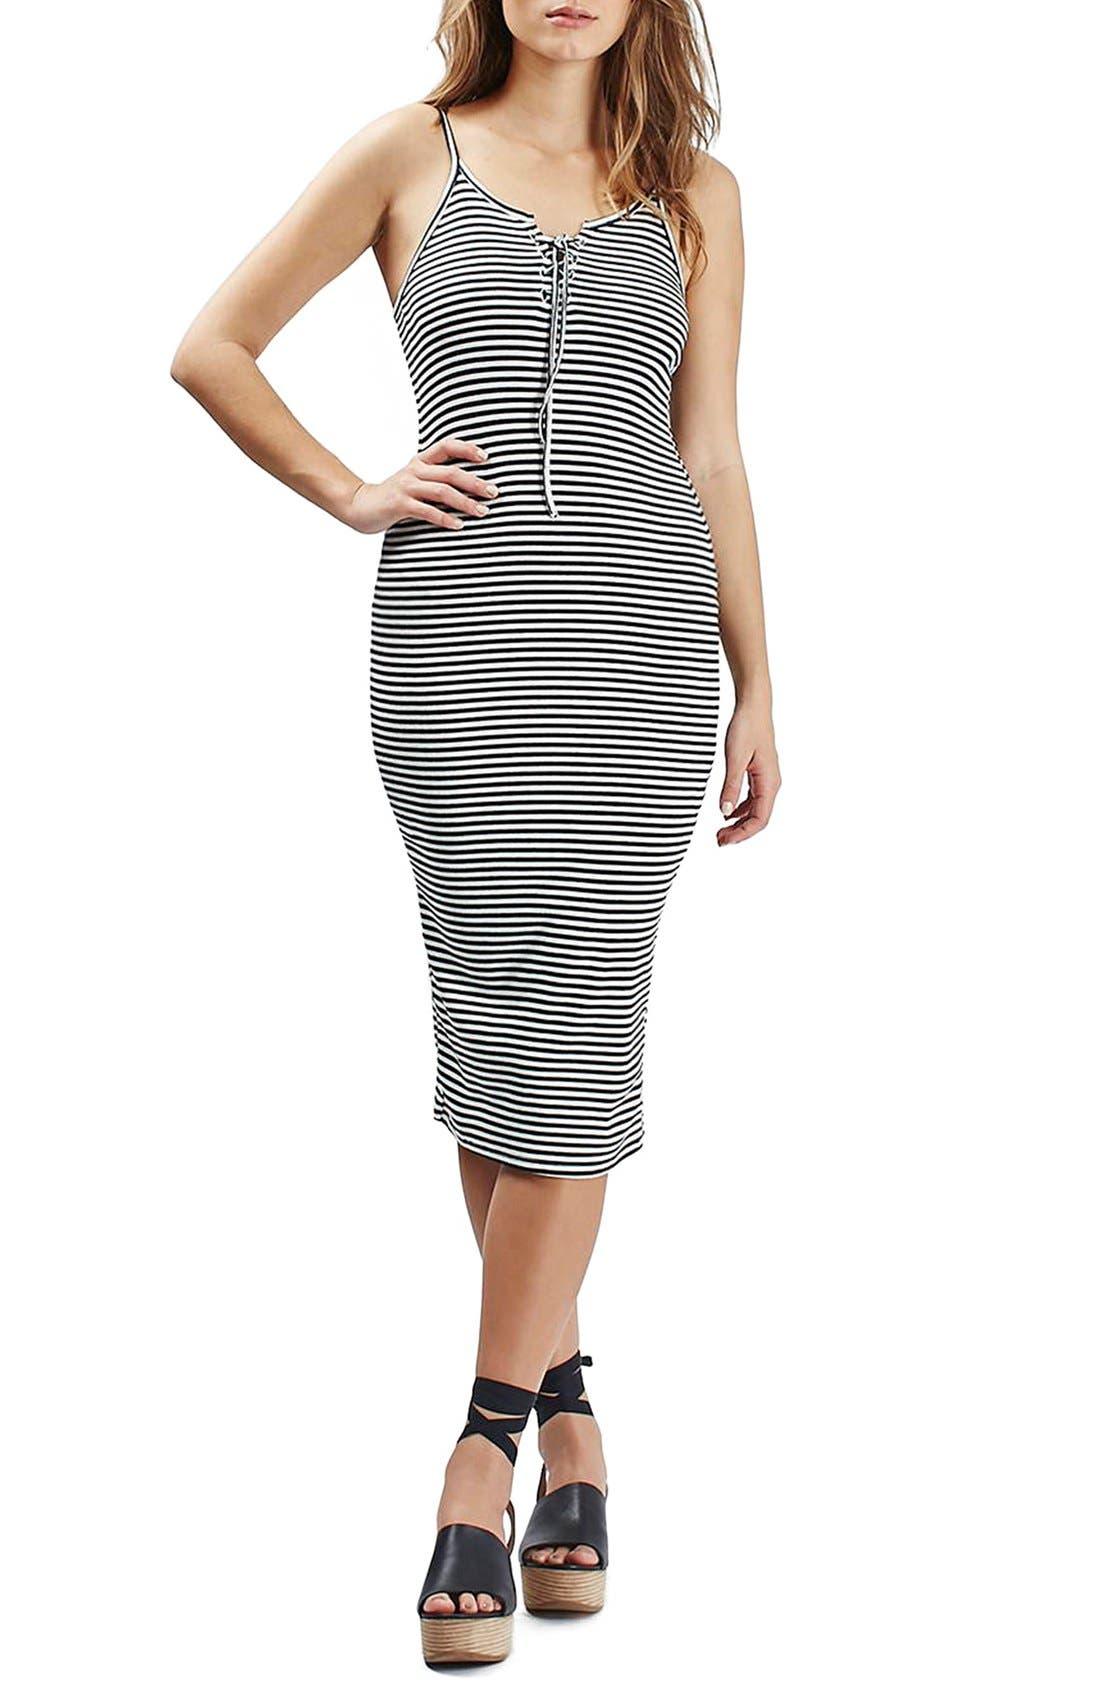 Alternate Image 1 Selected - Topshop Stripe Lace-Up Midi Dress (Regular & Petite)